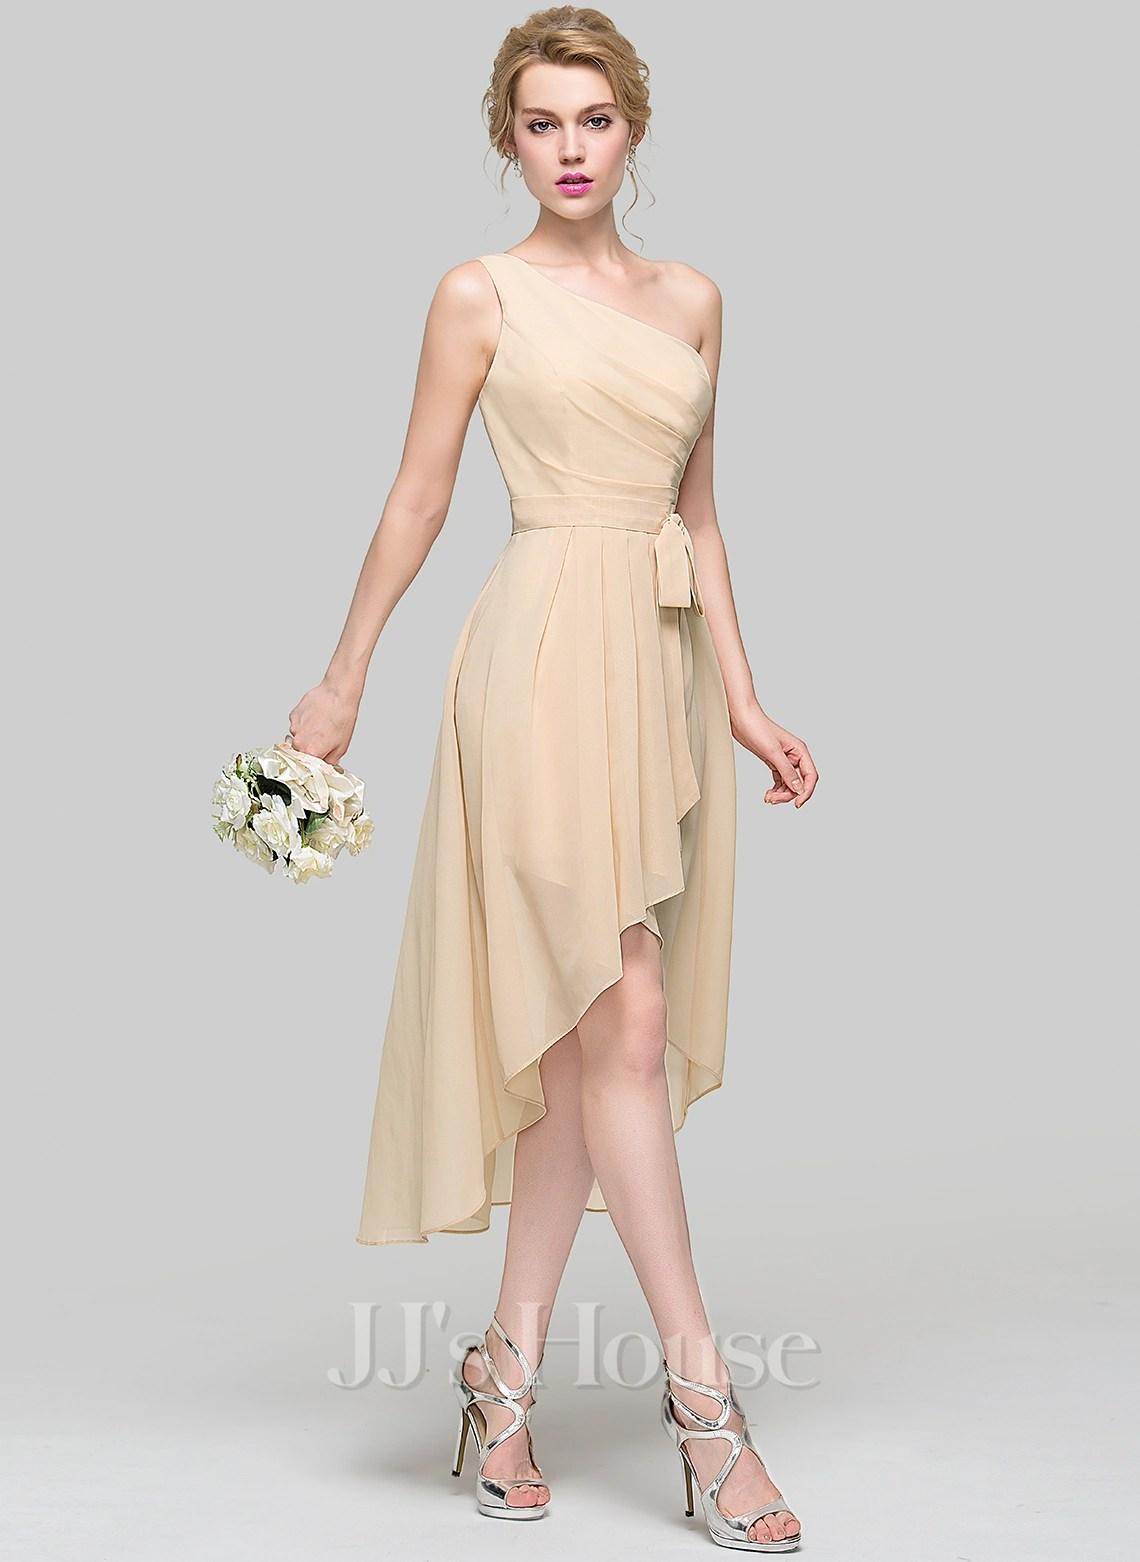 Bow White Knee Dress Length